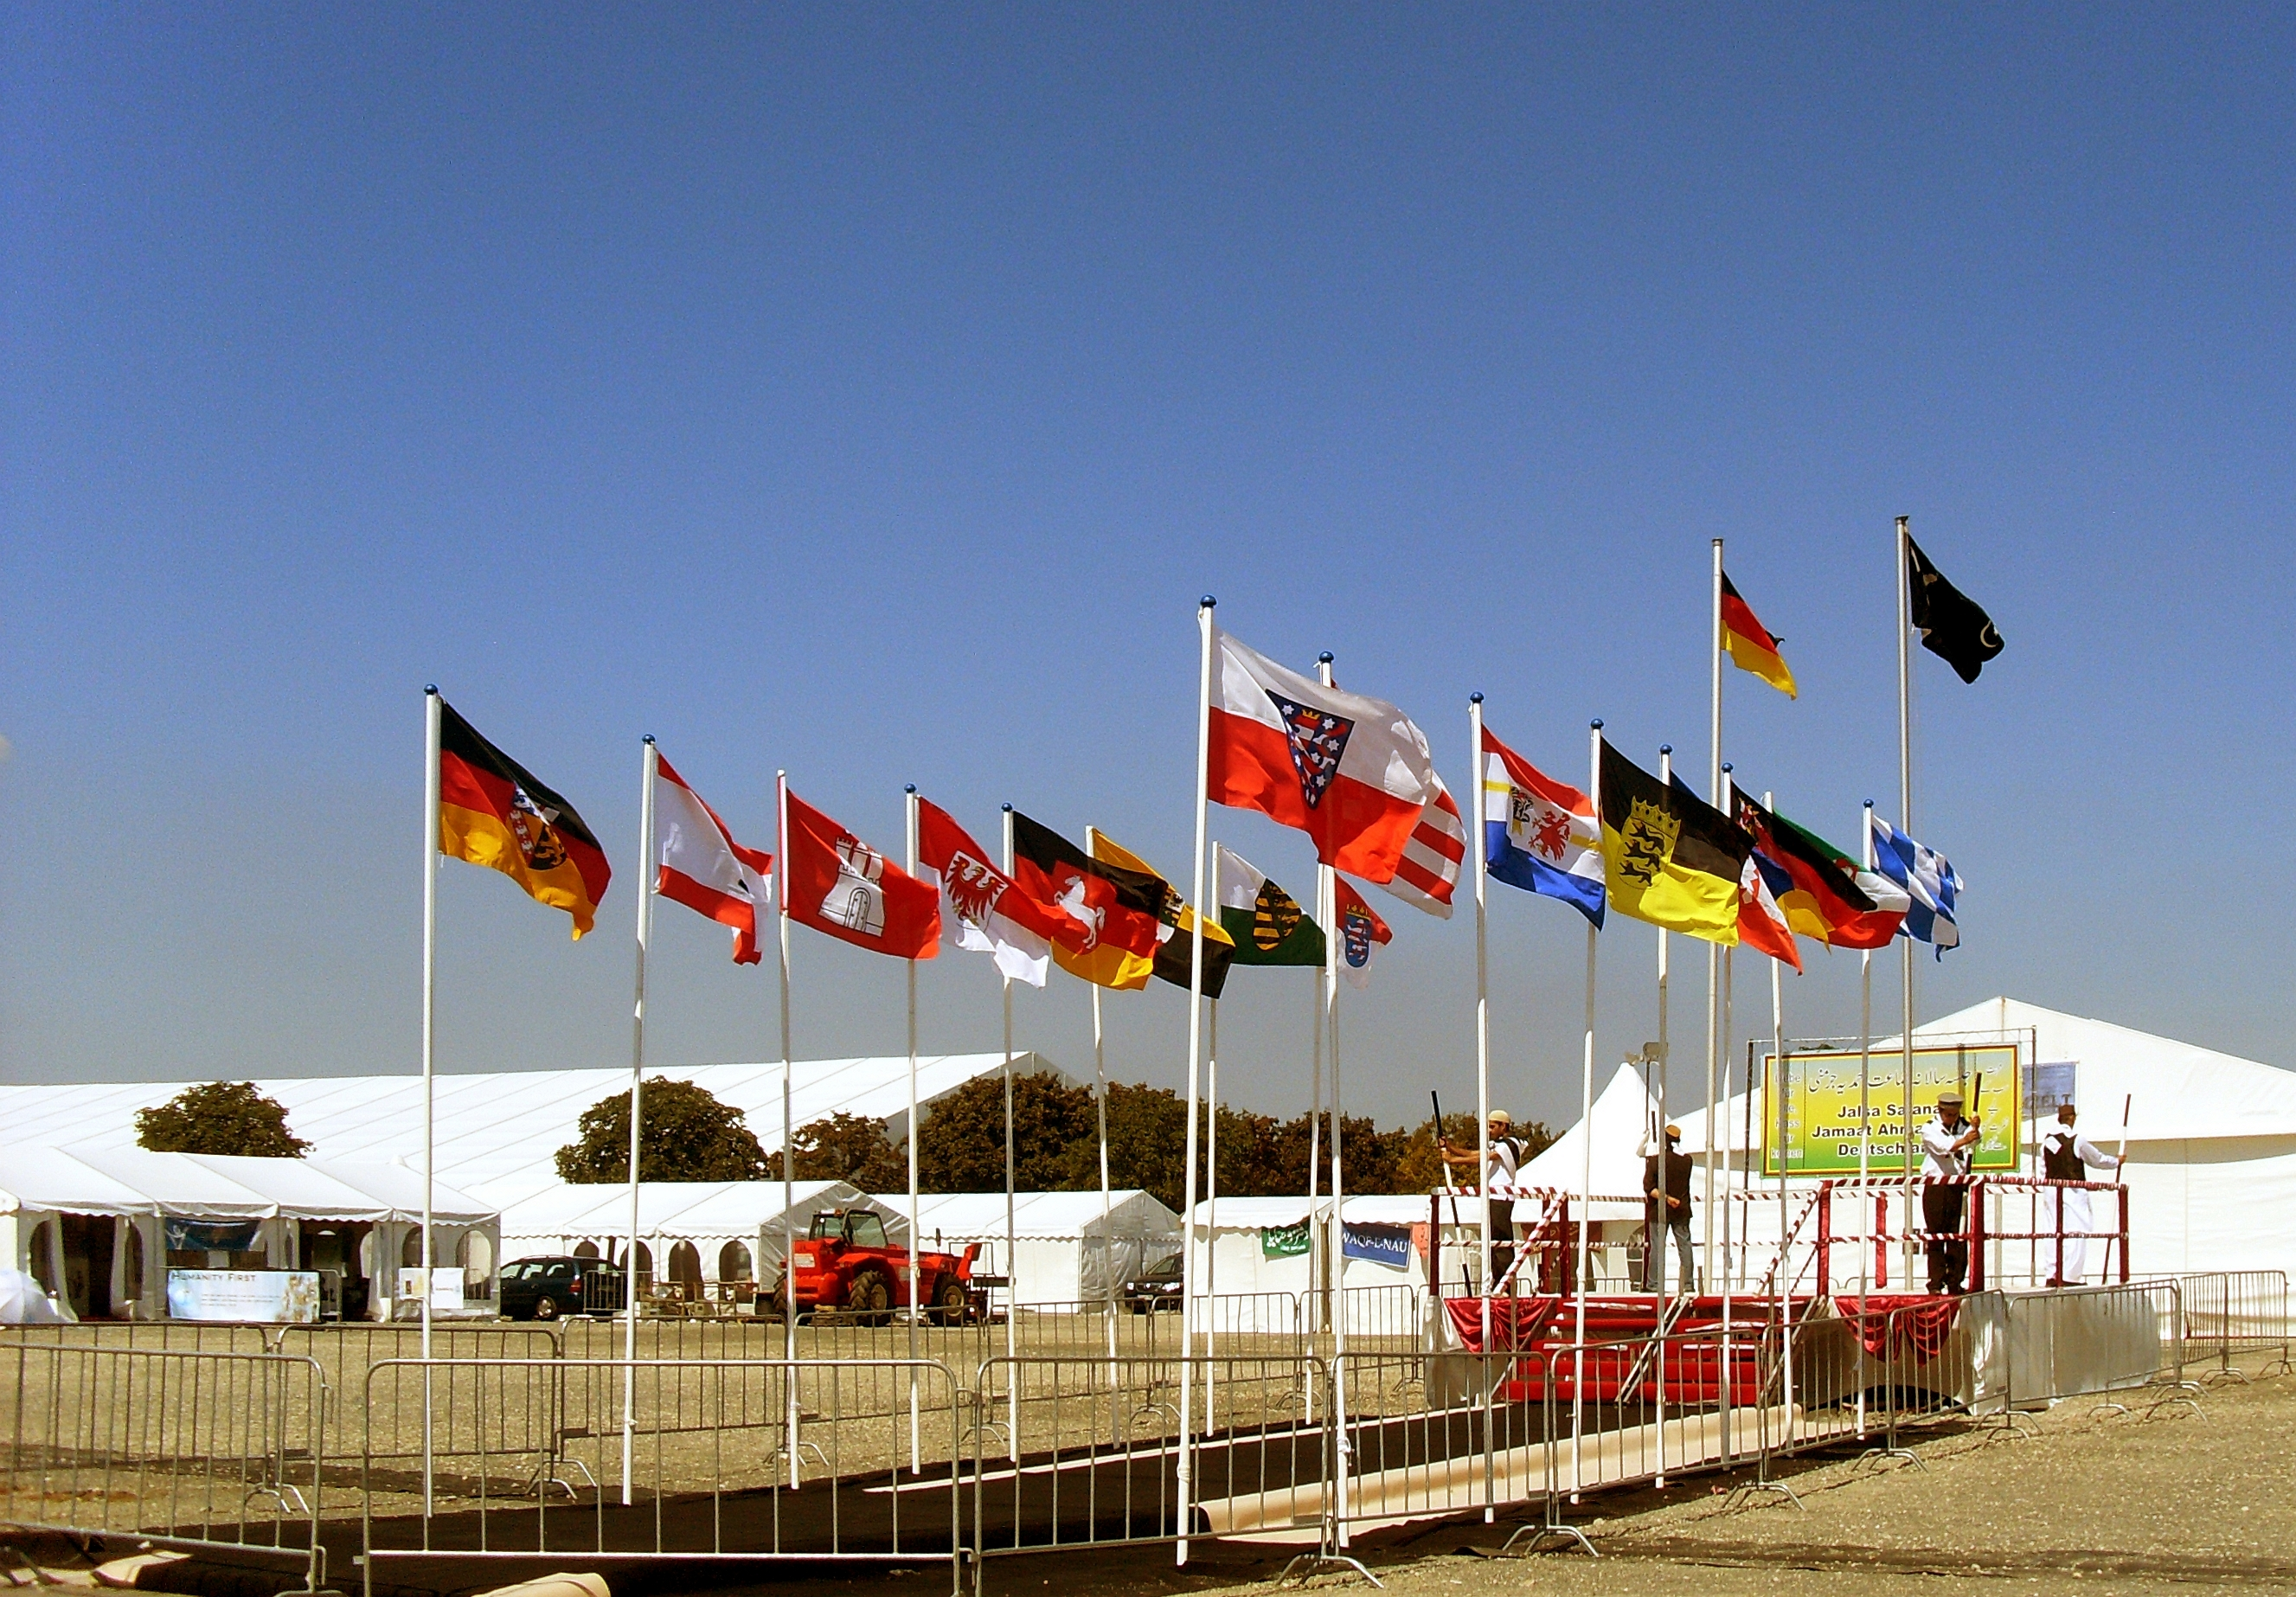 File:Flags at Jalsa Salana Germany 2009.jpg - Wikimedia ...